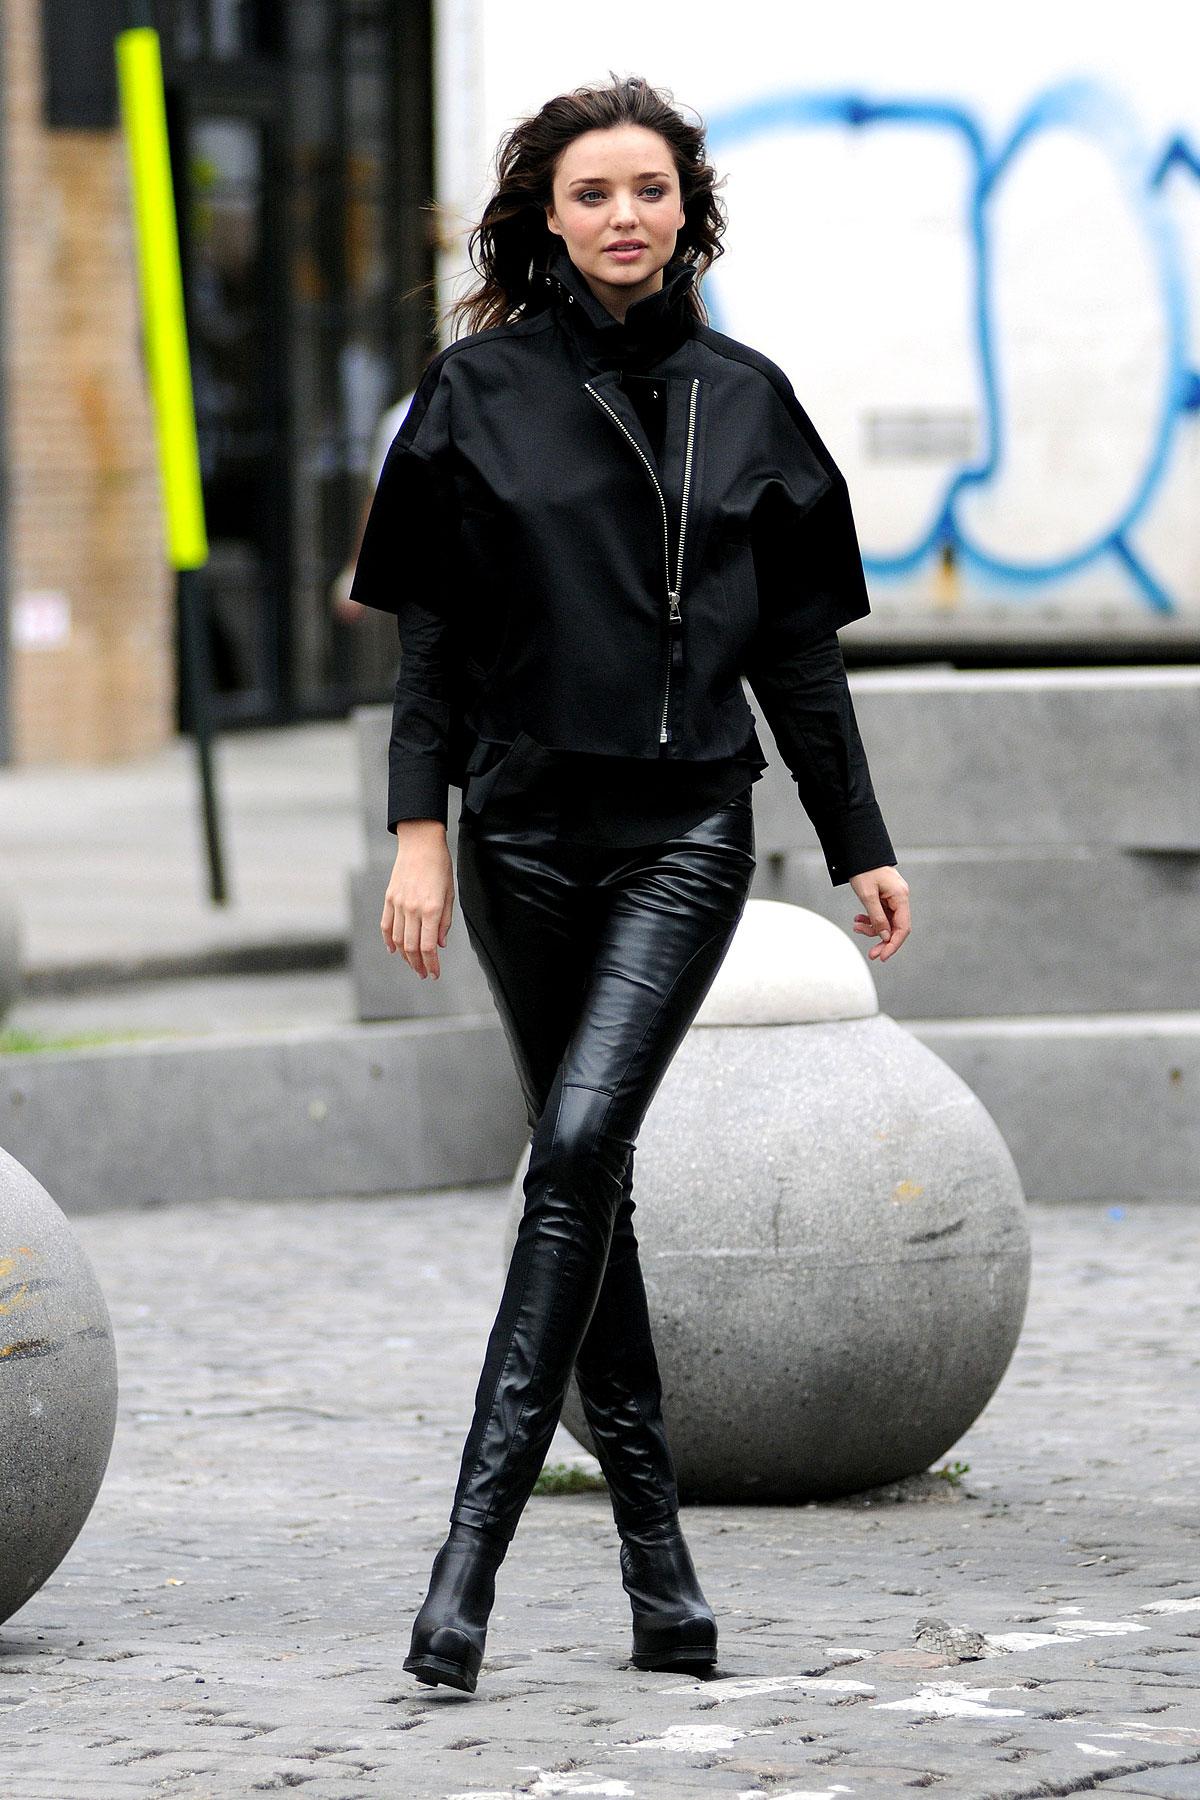 Miranda Kerr Wears Tight Leather 'Bants' (PHOTOS)